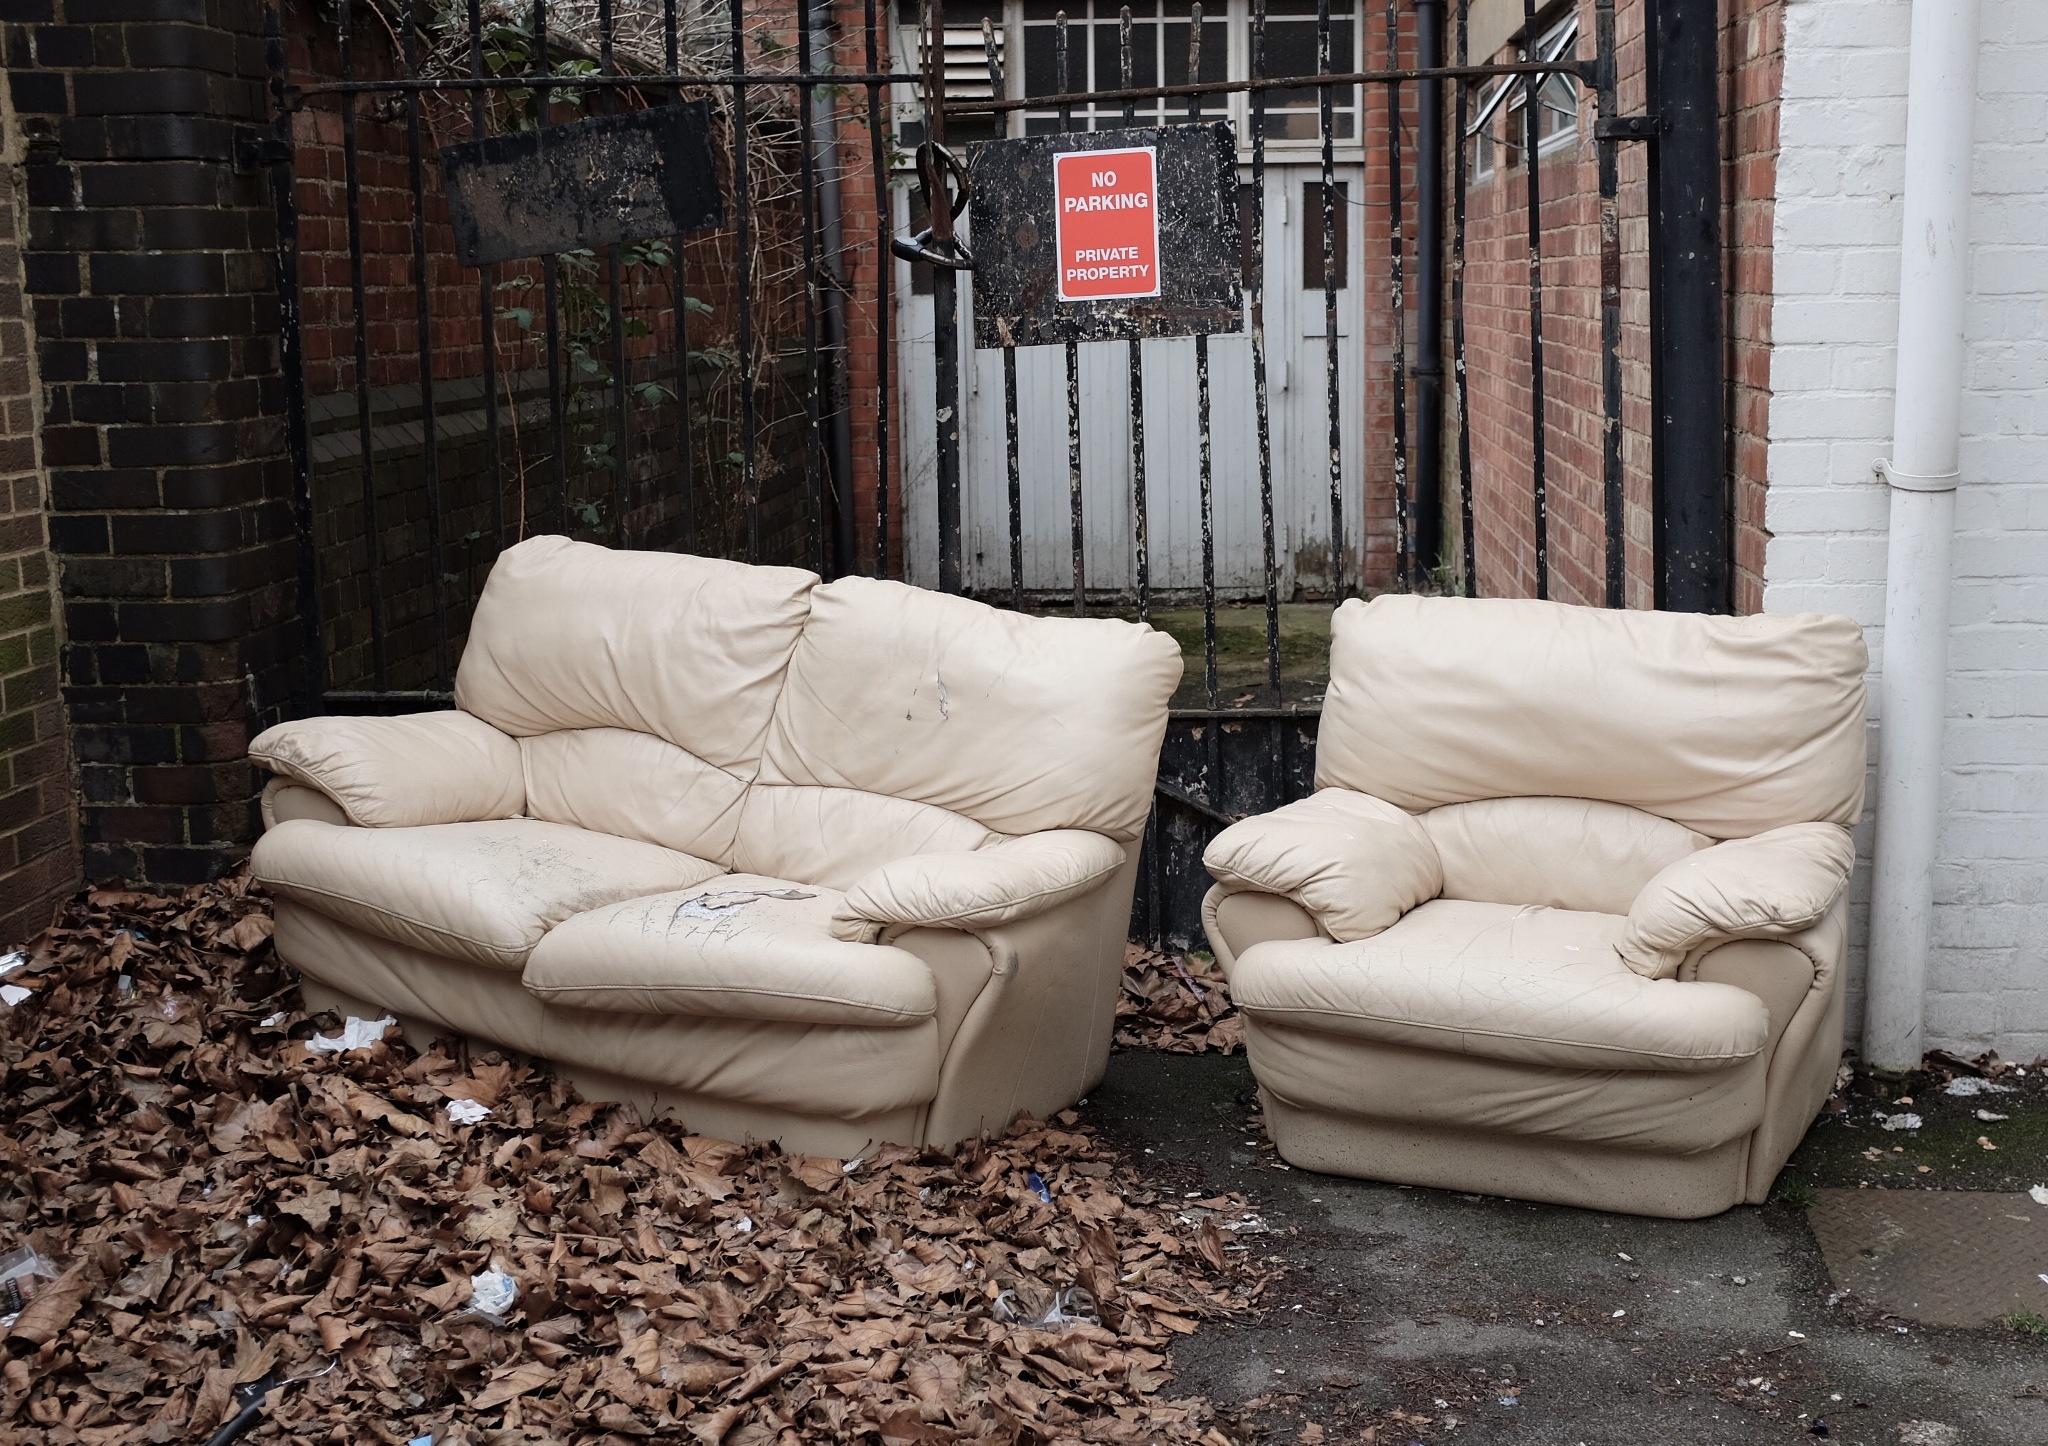 Old Sofas,Gloucester UK by Jim Darke